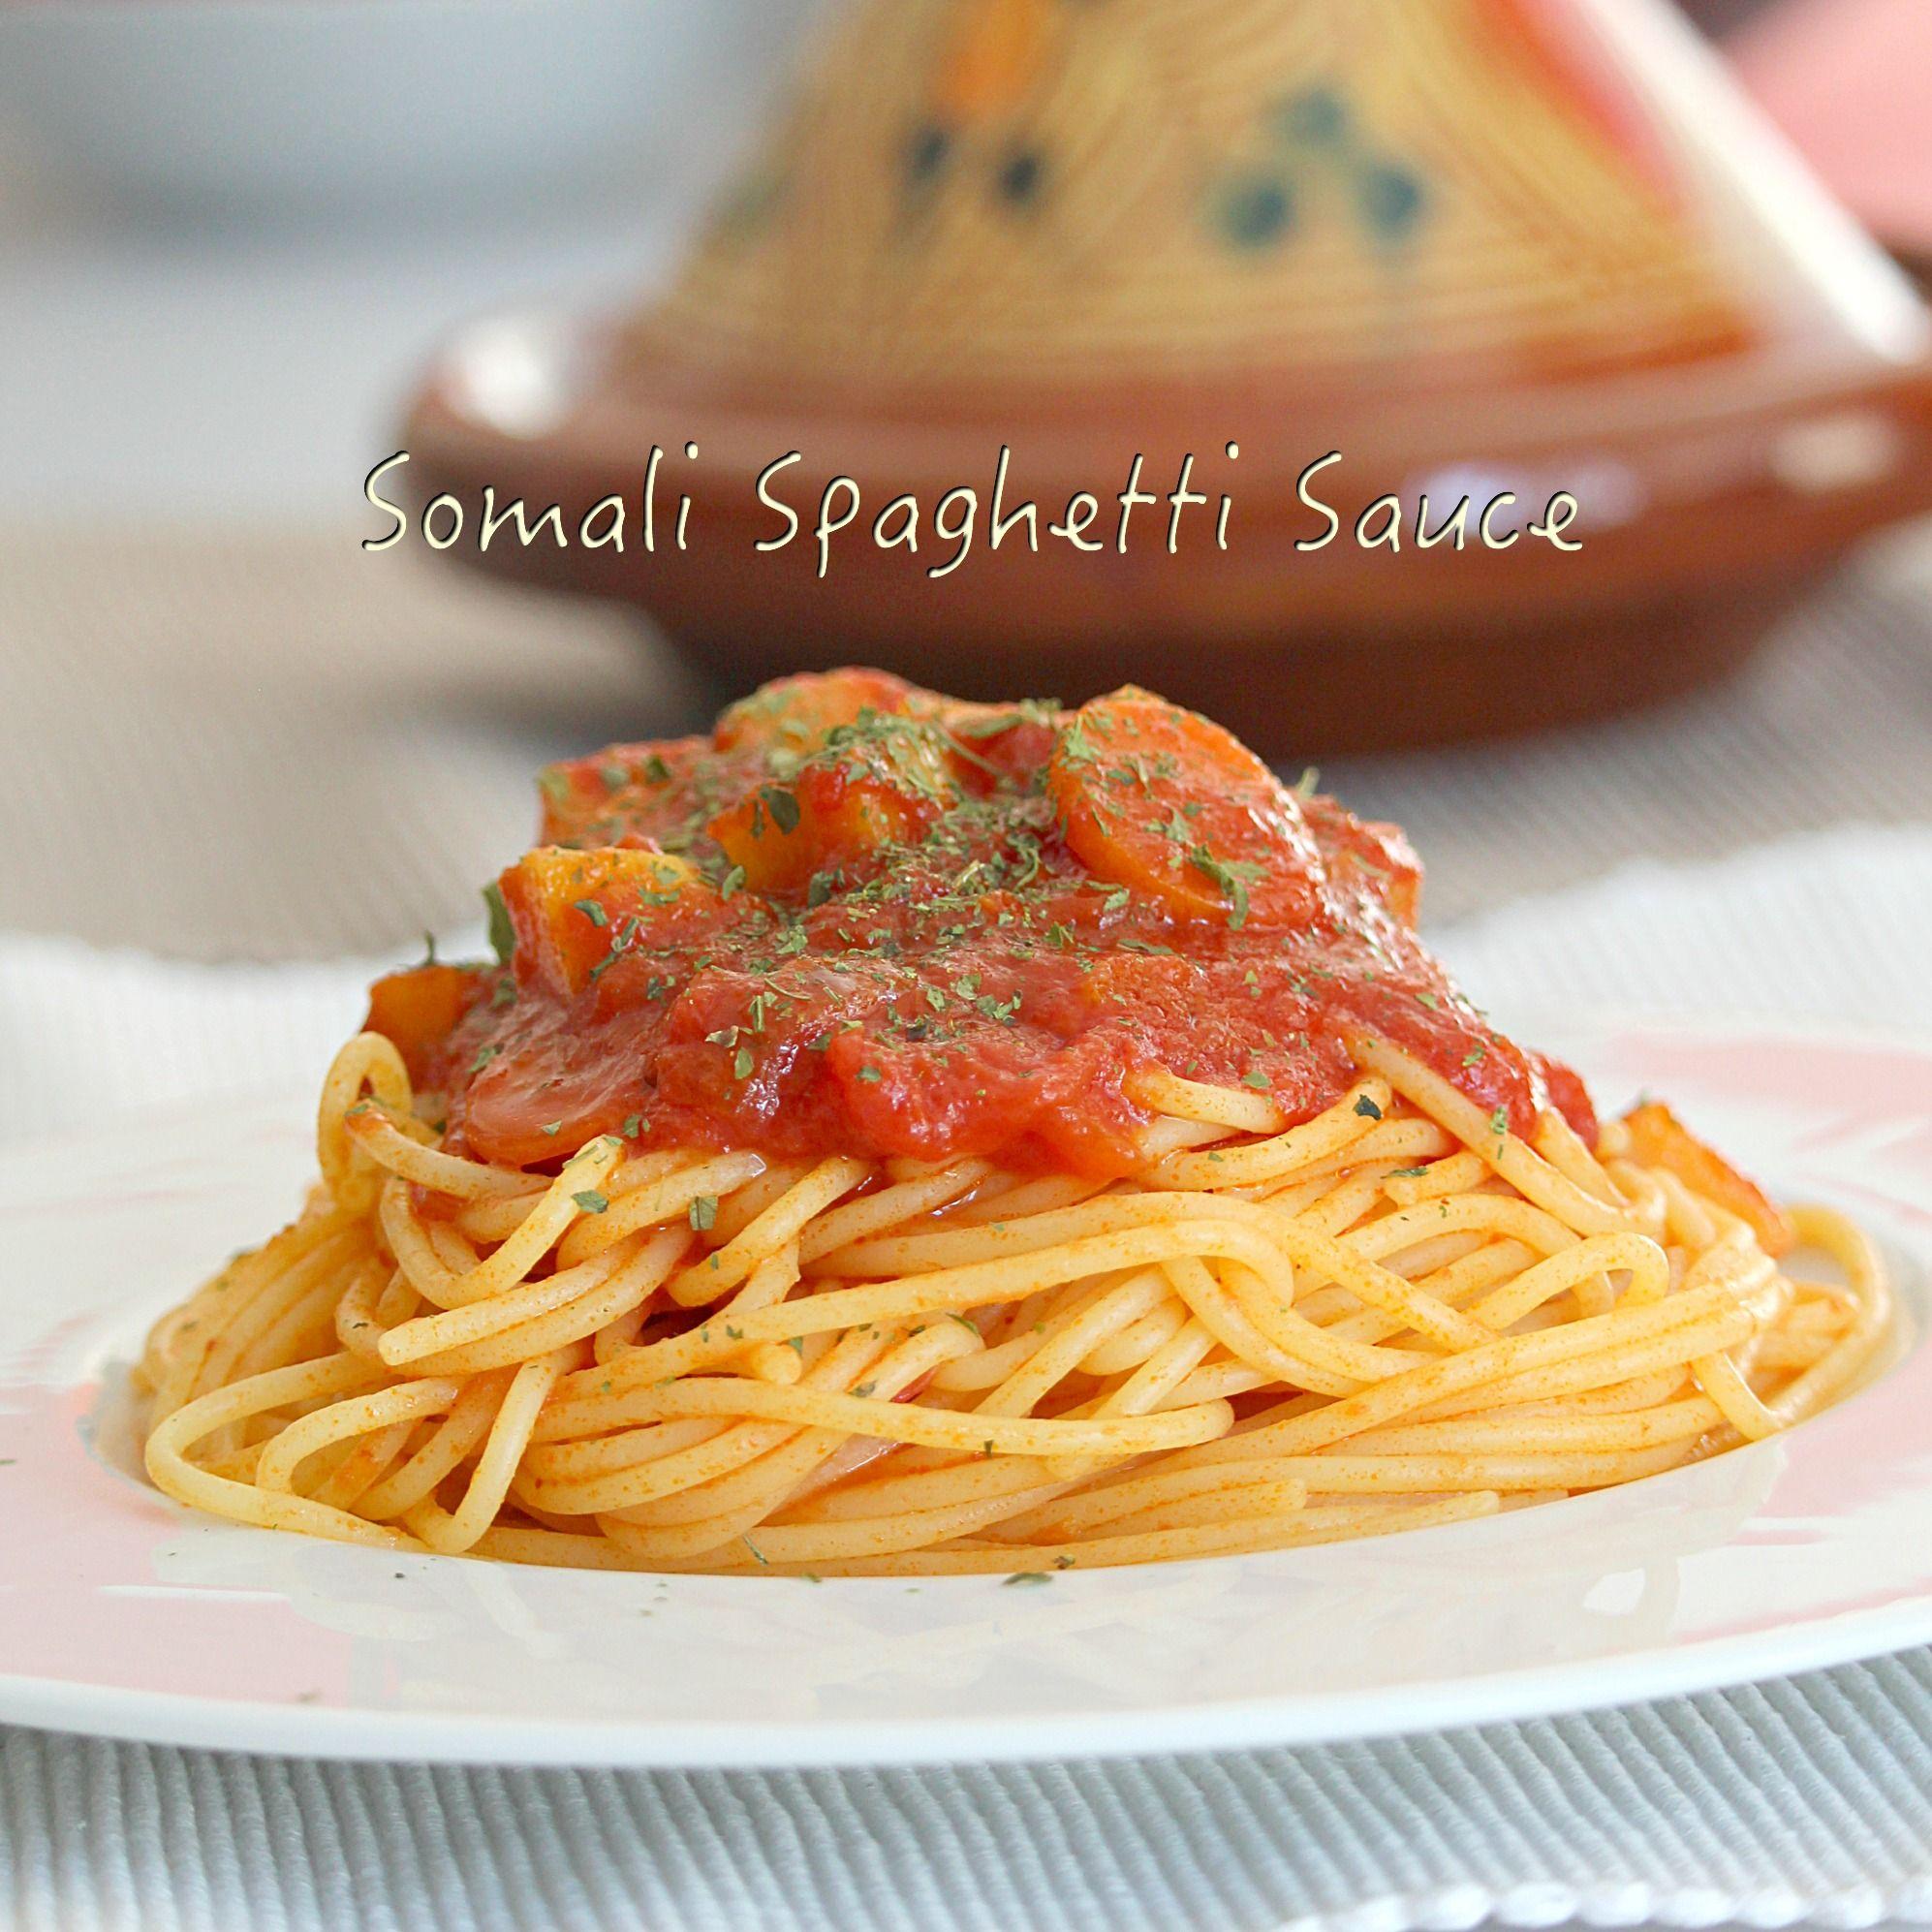 The 25 best somali spaghetti recipe ideas on pinterest somali the 25 best somali spaghetti recipe ideas on pinterest somali rice recipe somali food recipe and somali recipe forumfinder Images